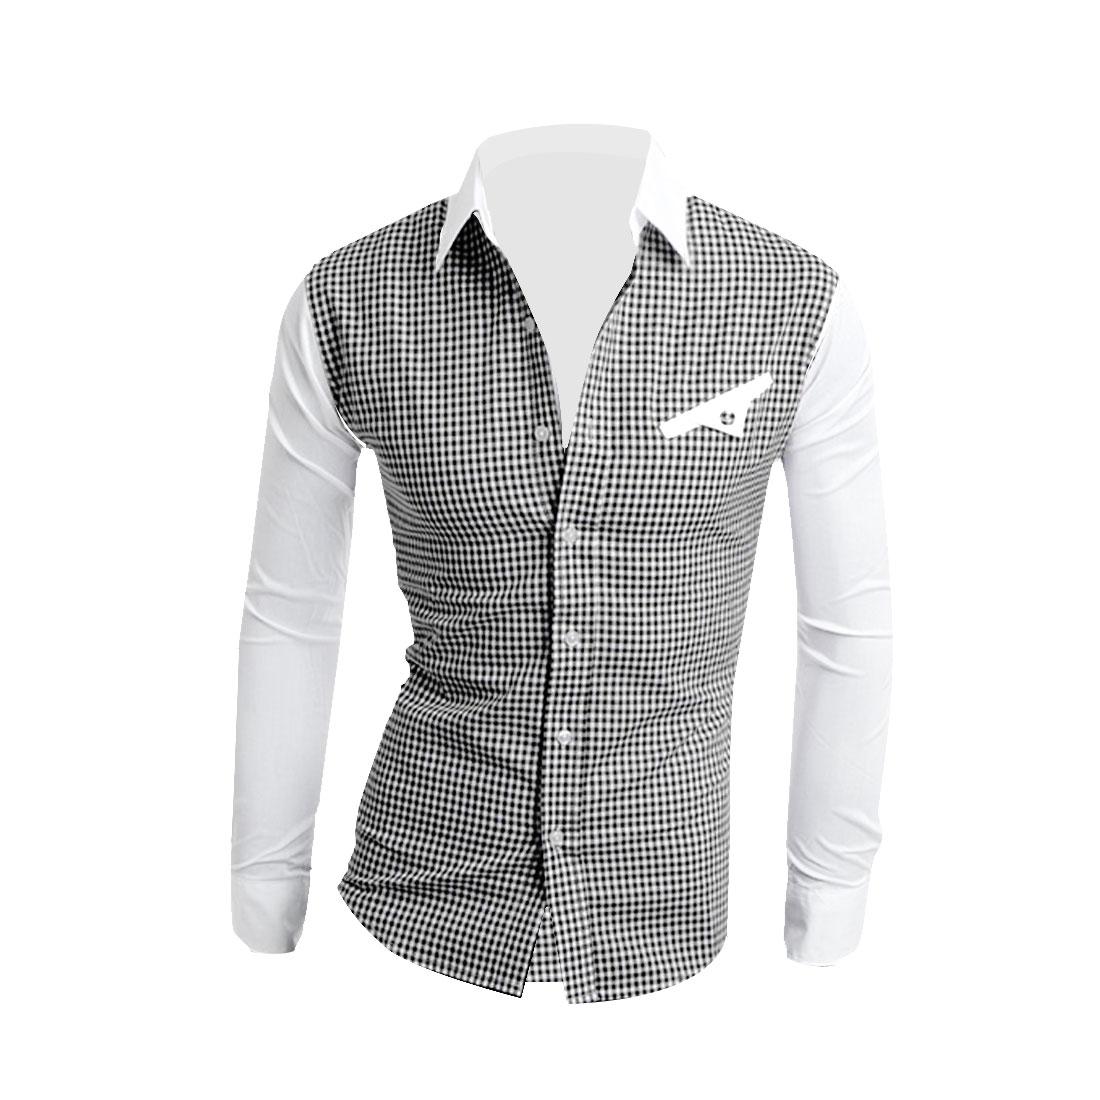 Men Point Collar Button Down Plaids Shirt Black White M